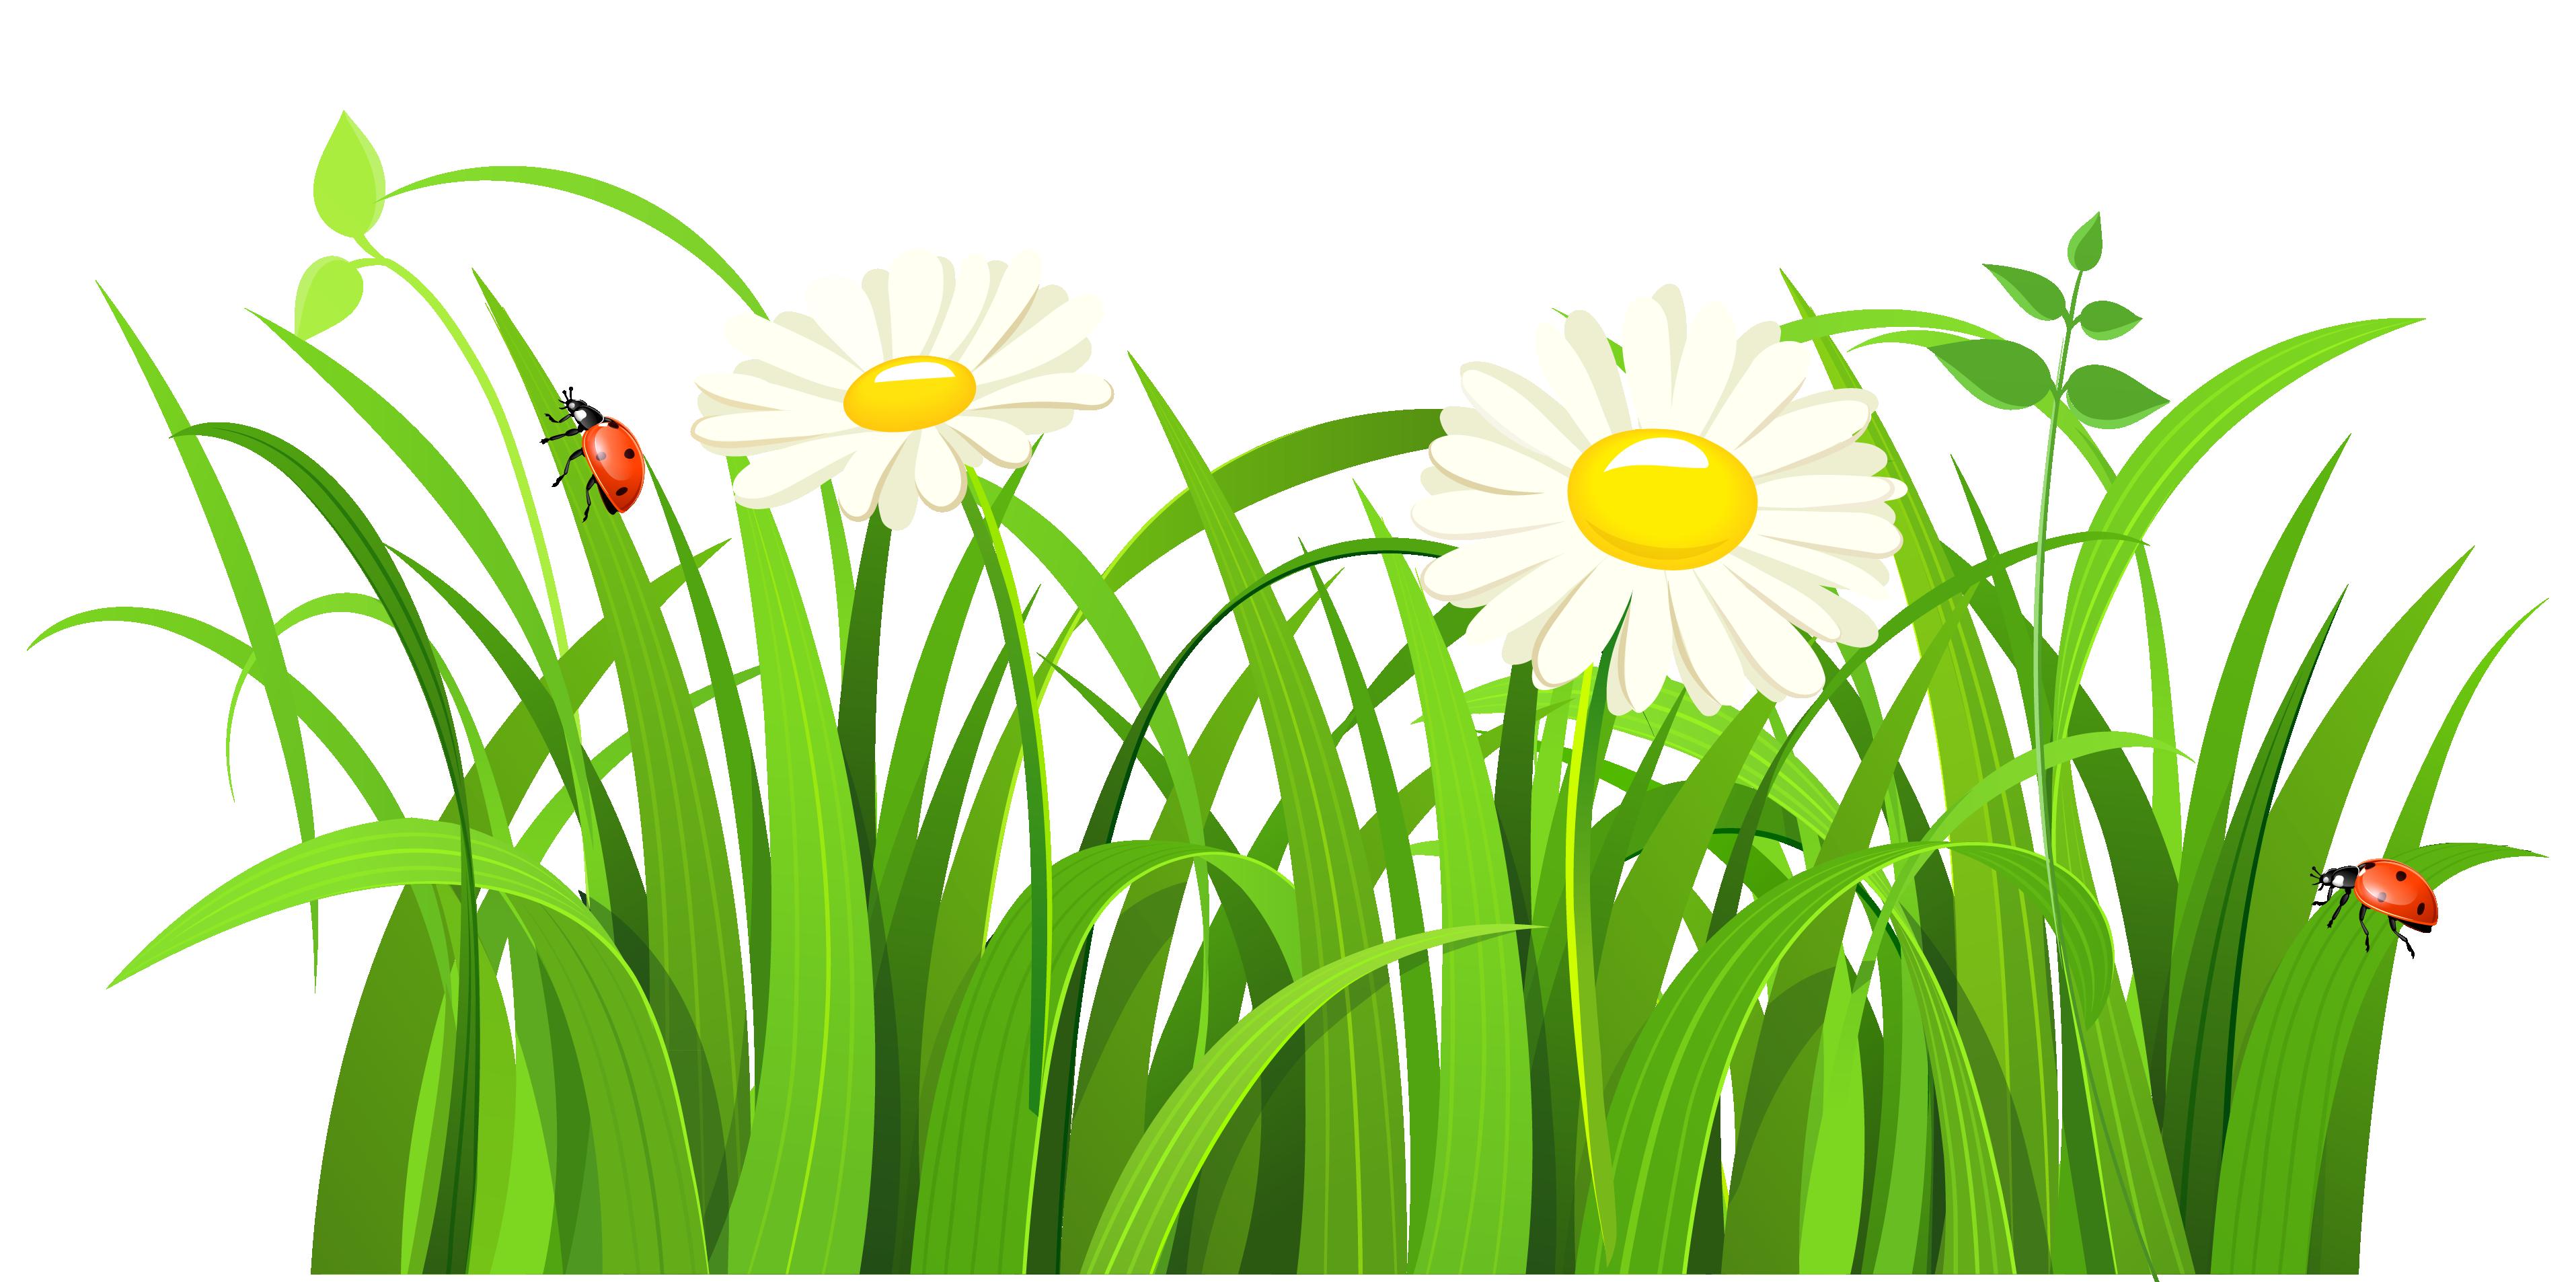 Grass Clipart Clipartcow-Grass clipart clipartcow-10